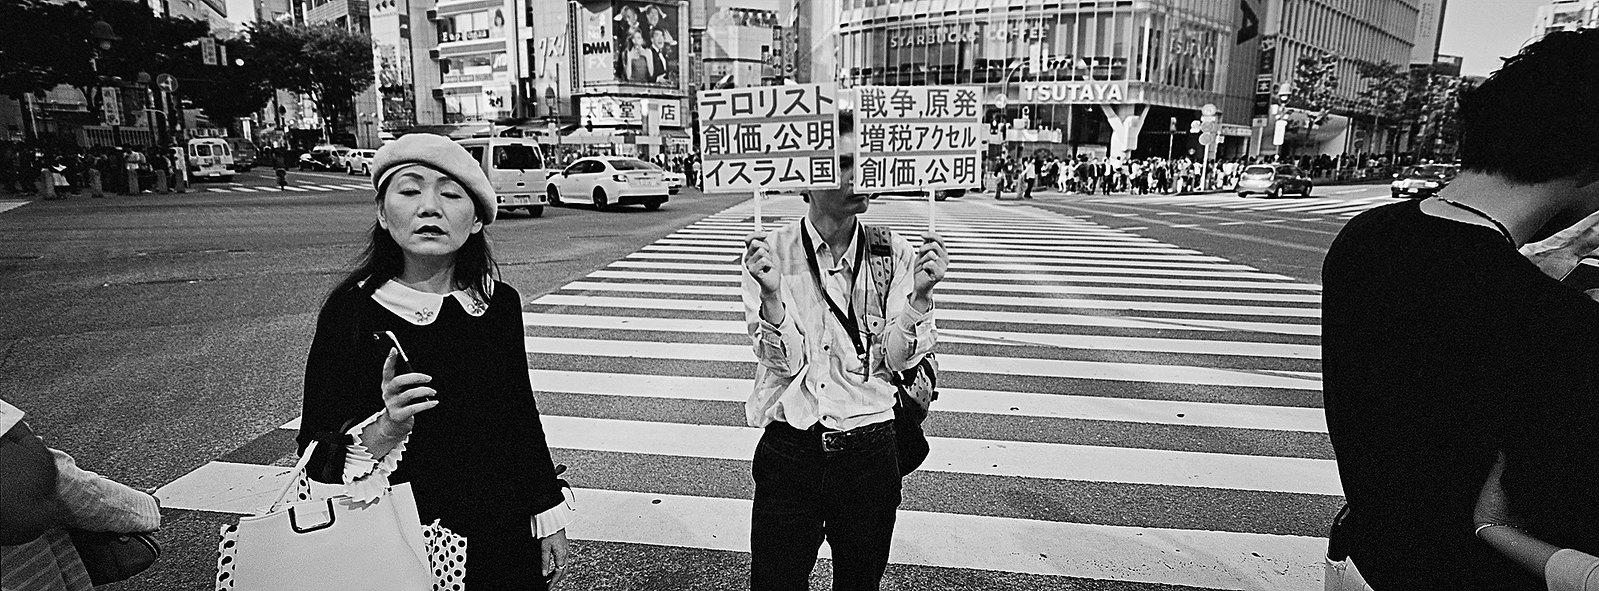 Shibuya Sign Man ii